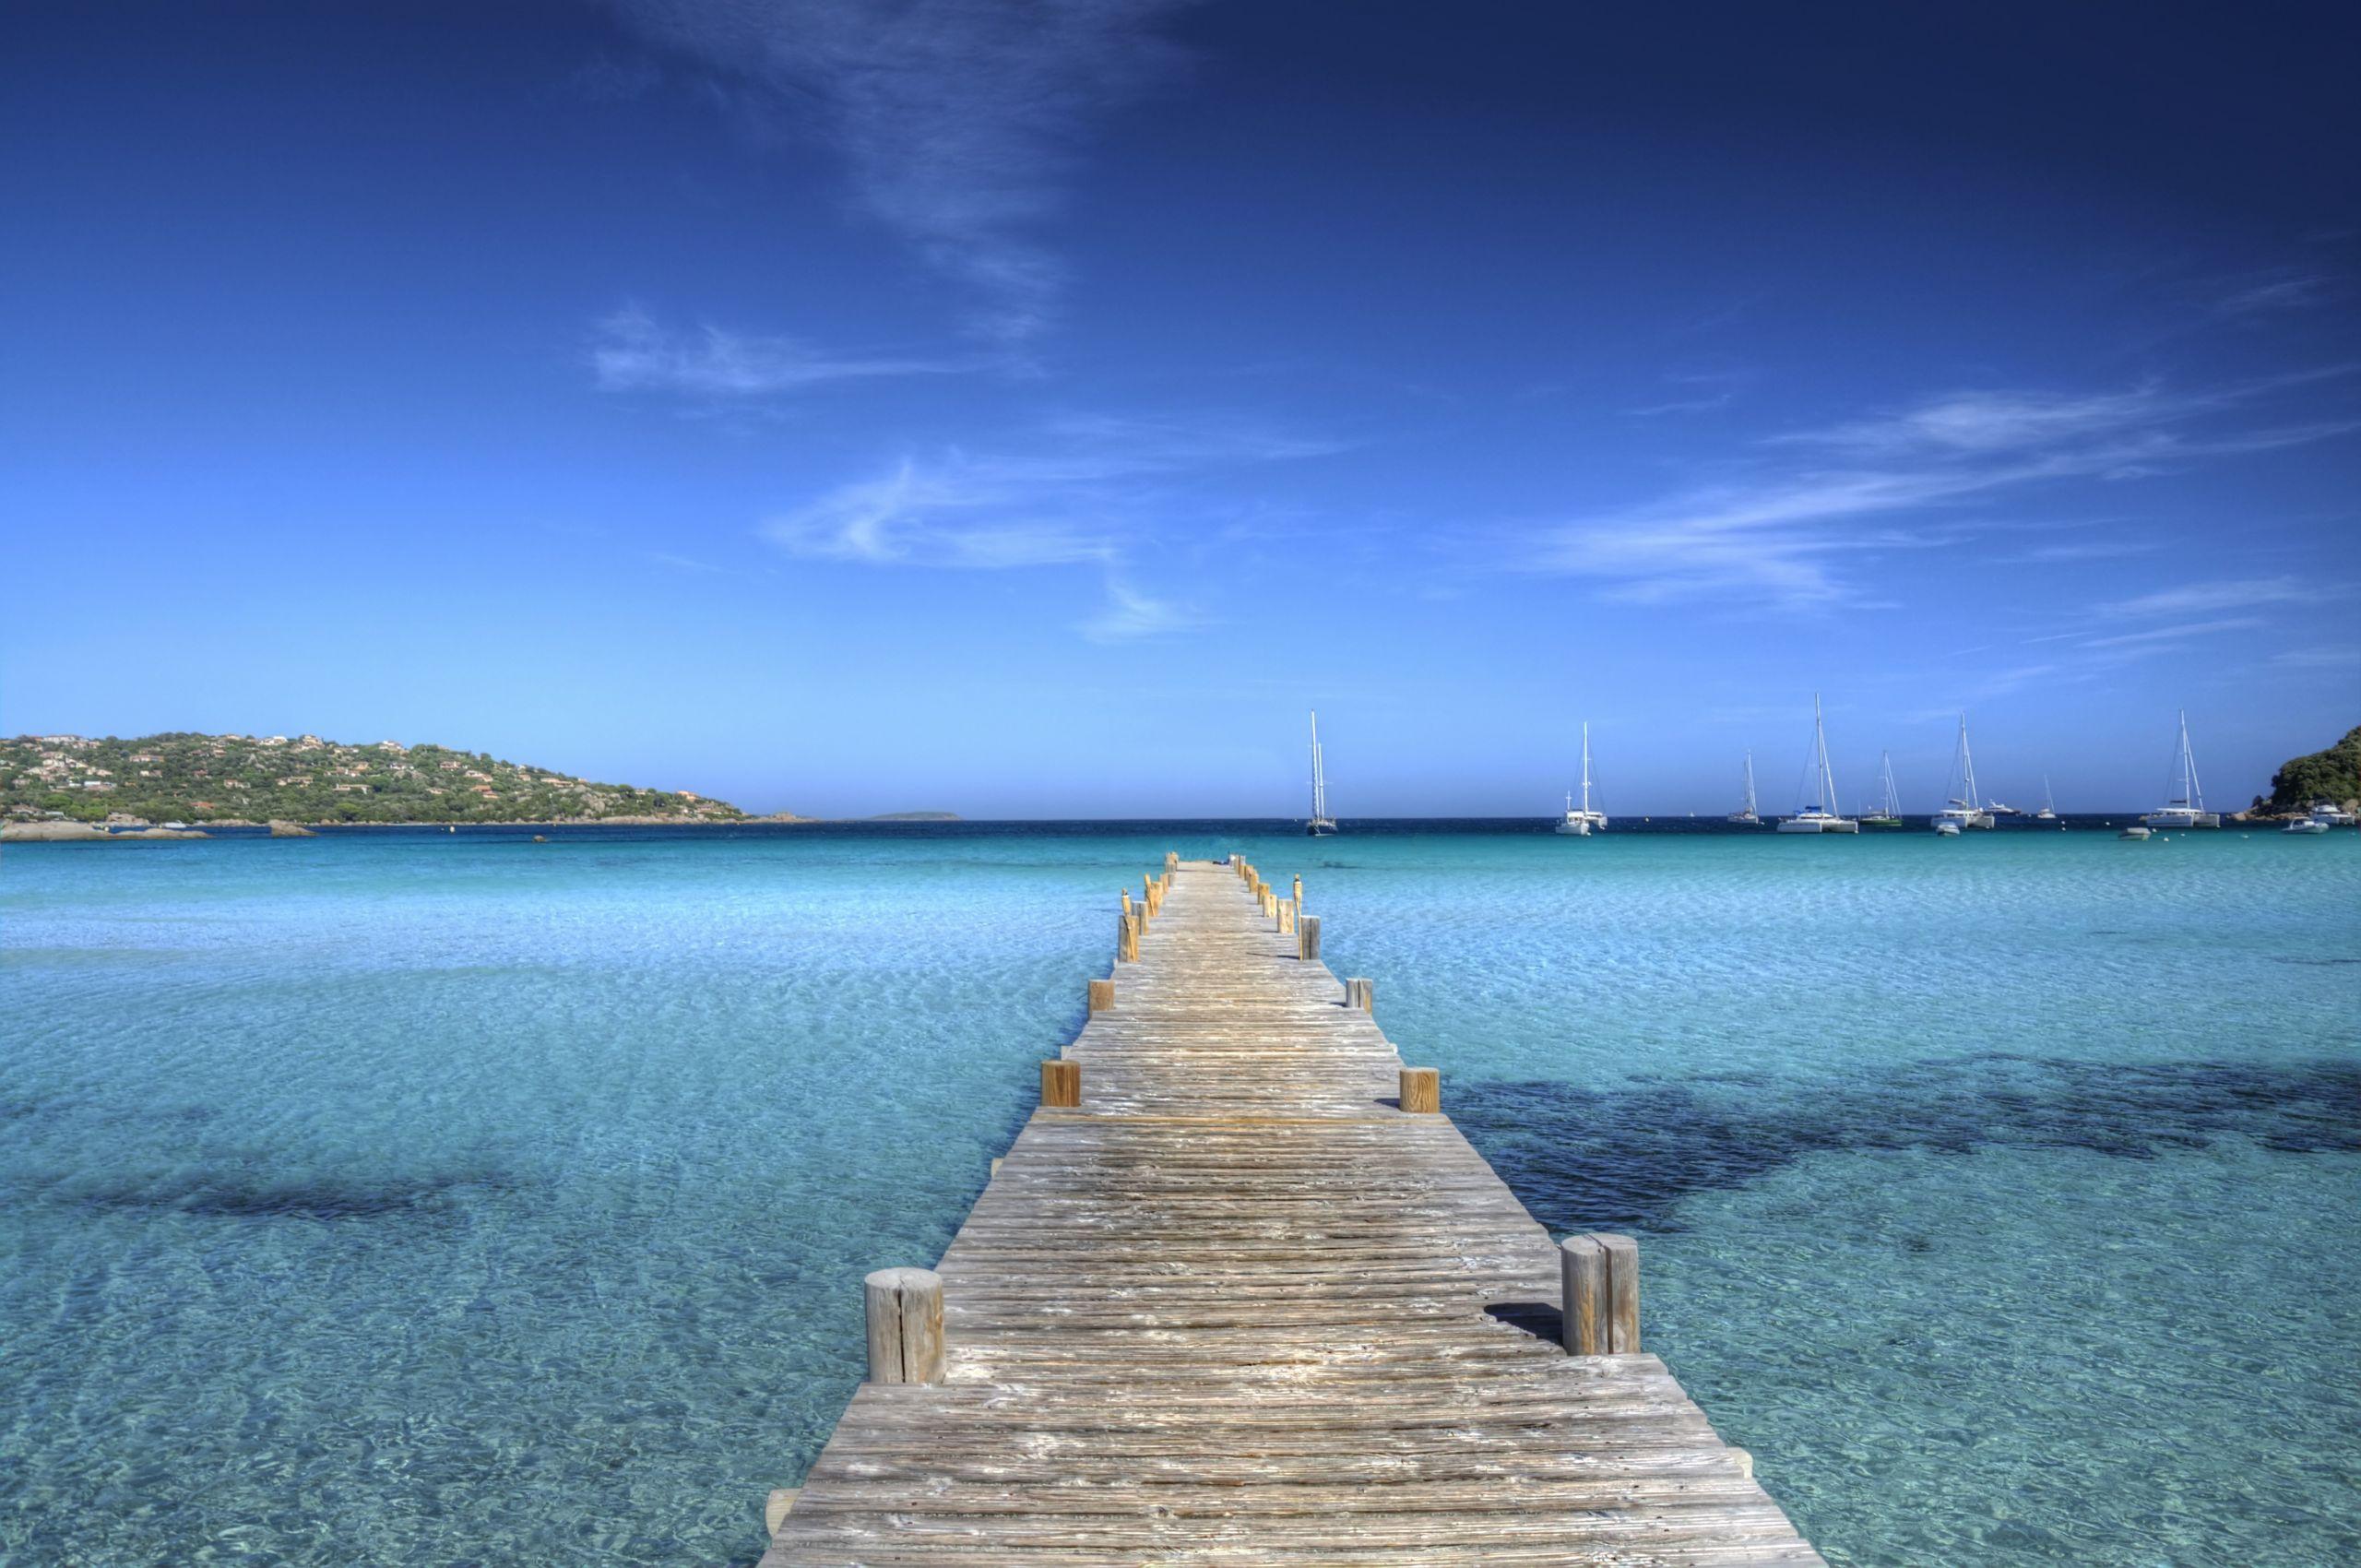 Fonds d'écran Nature Iles Paradisiaques Plage de Santa Giulia - Corse du Sud